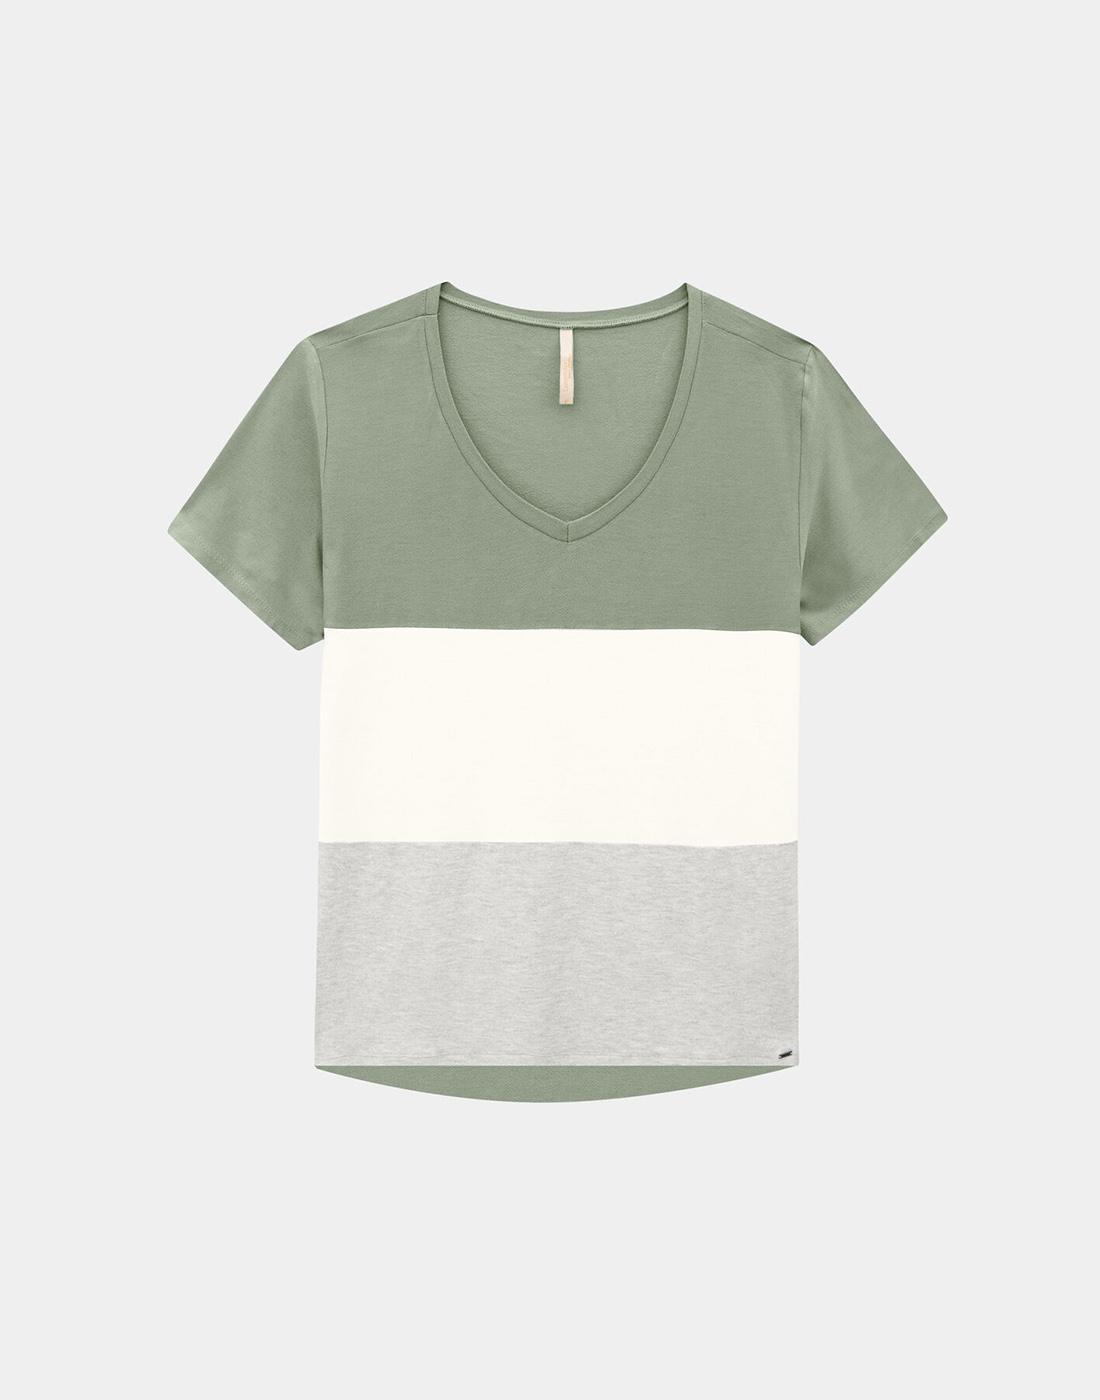 Blusa Decote V Plus Size Malha Crepe Verde Mineral Lunender Mais Mulher